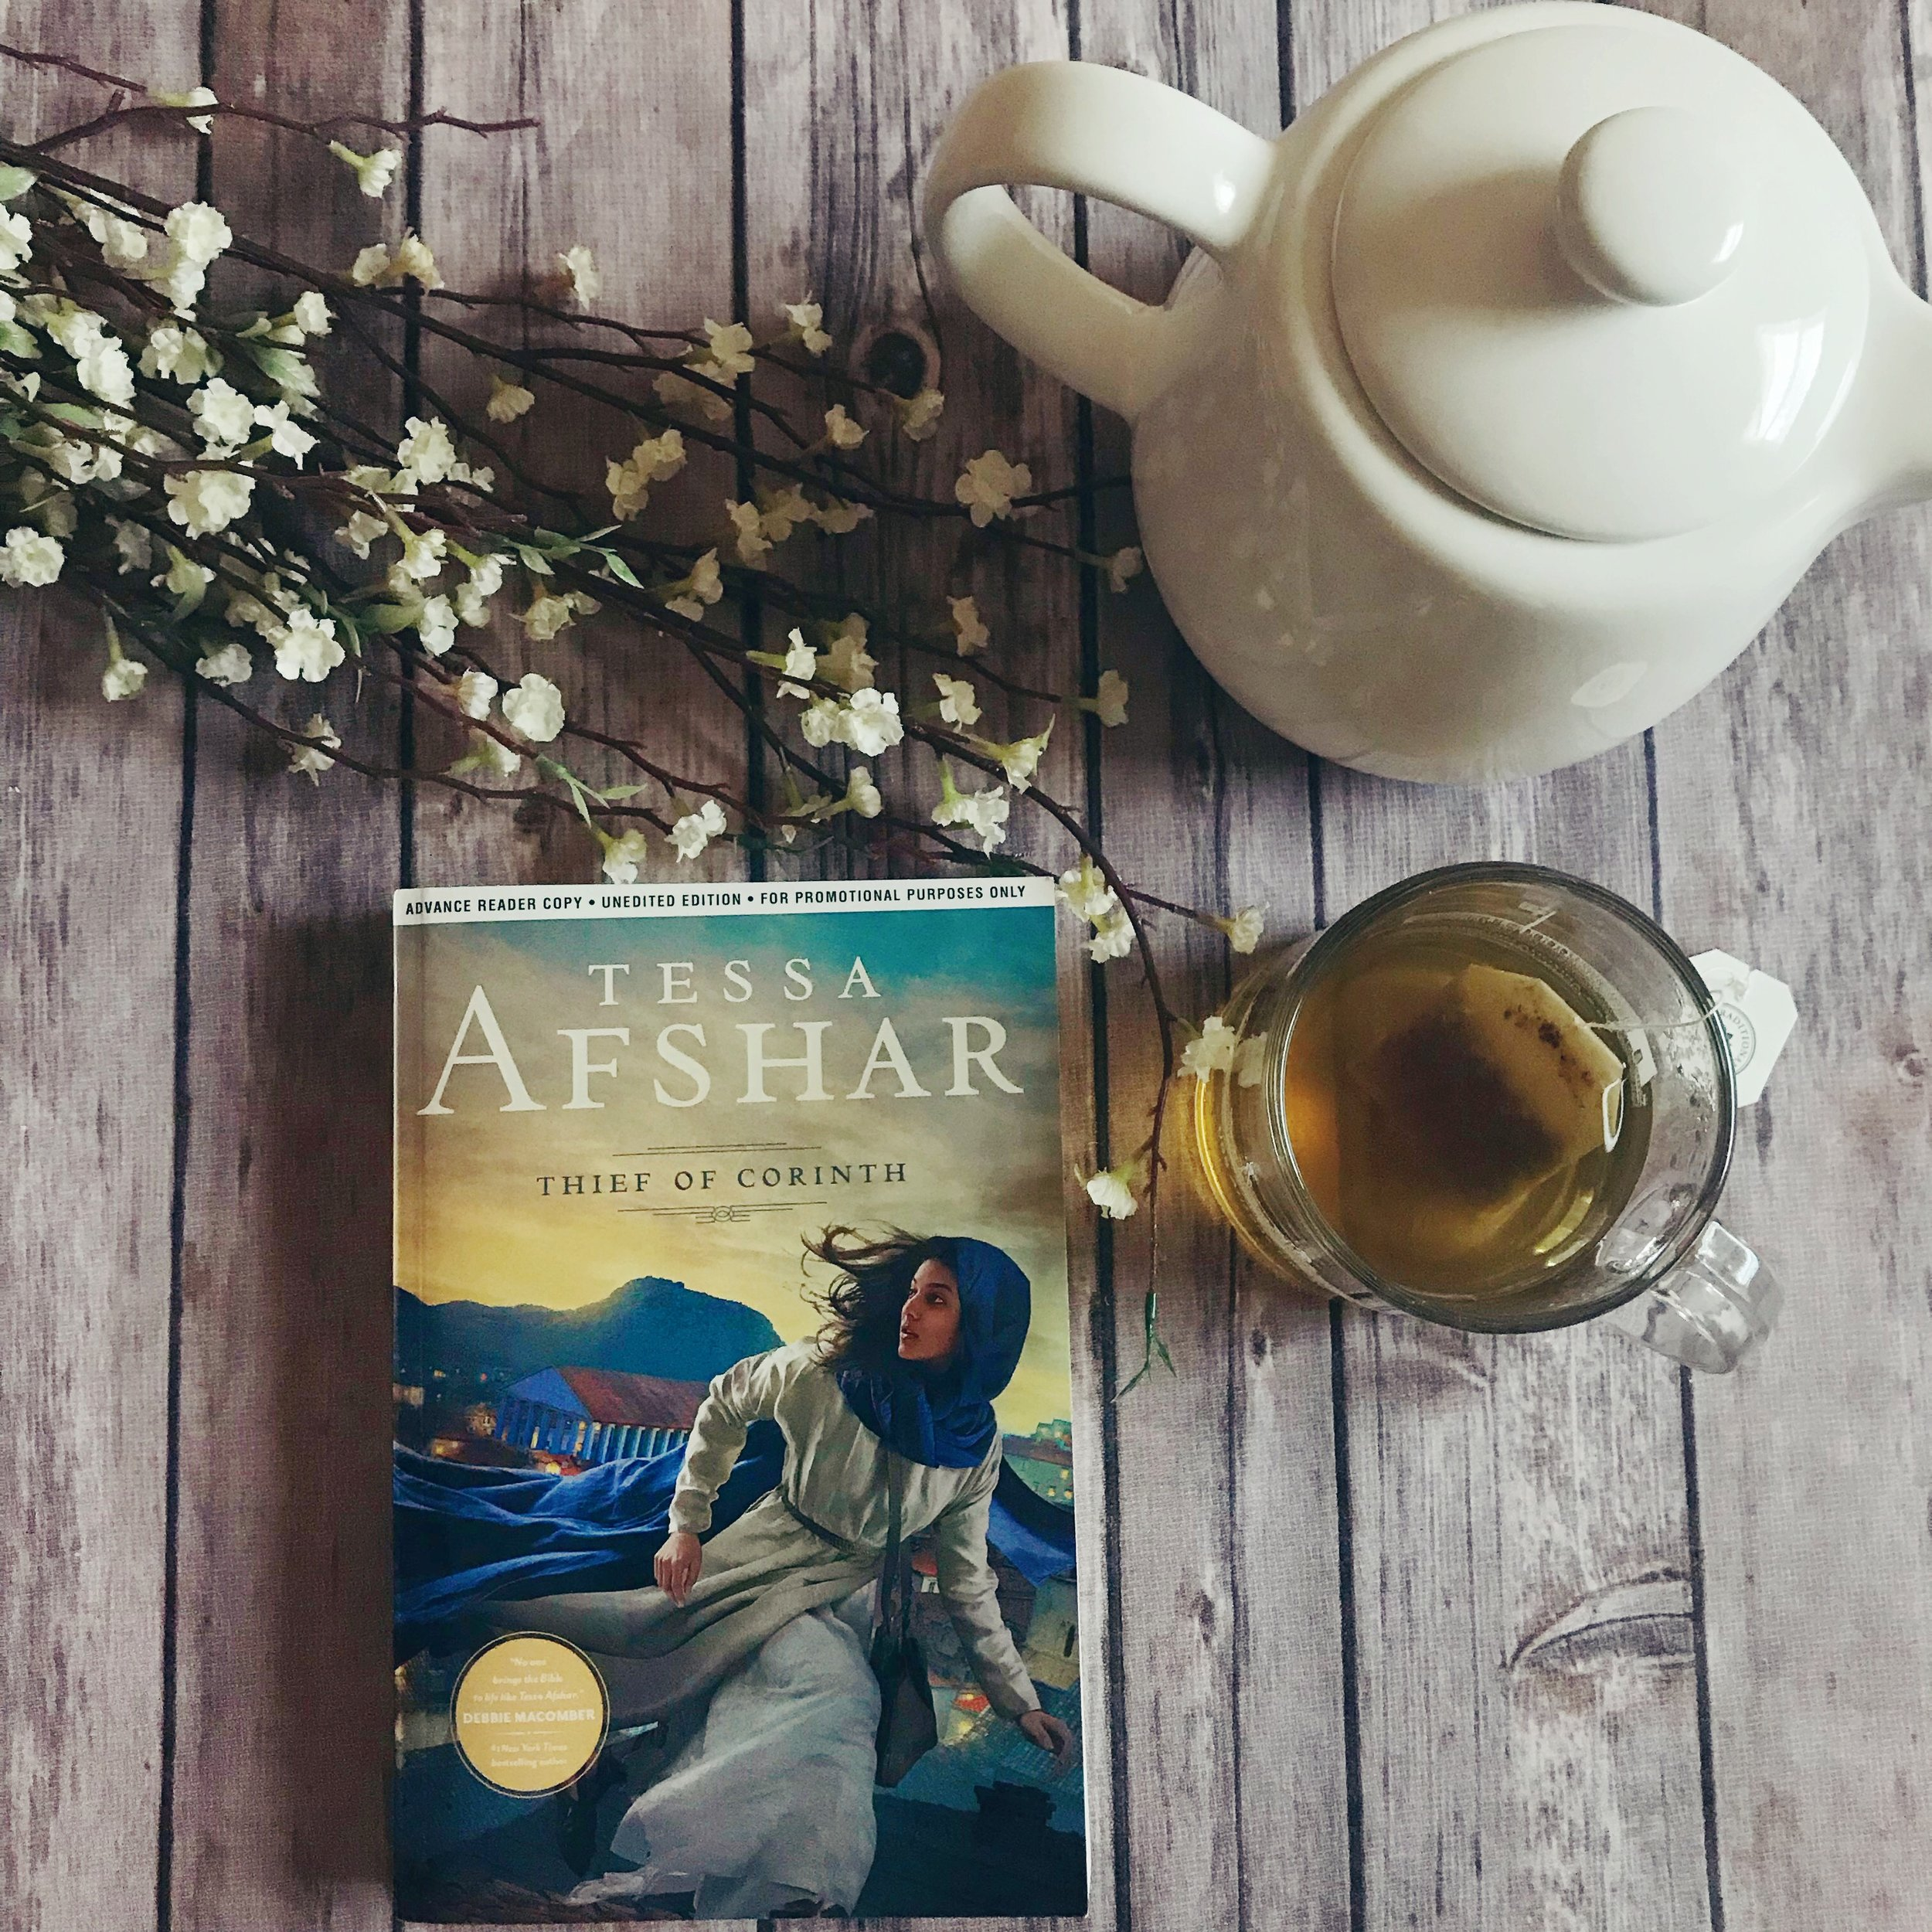 tessa afshar thief of corinth book review